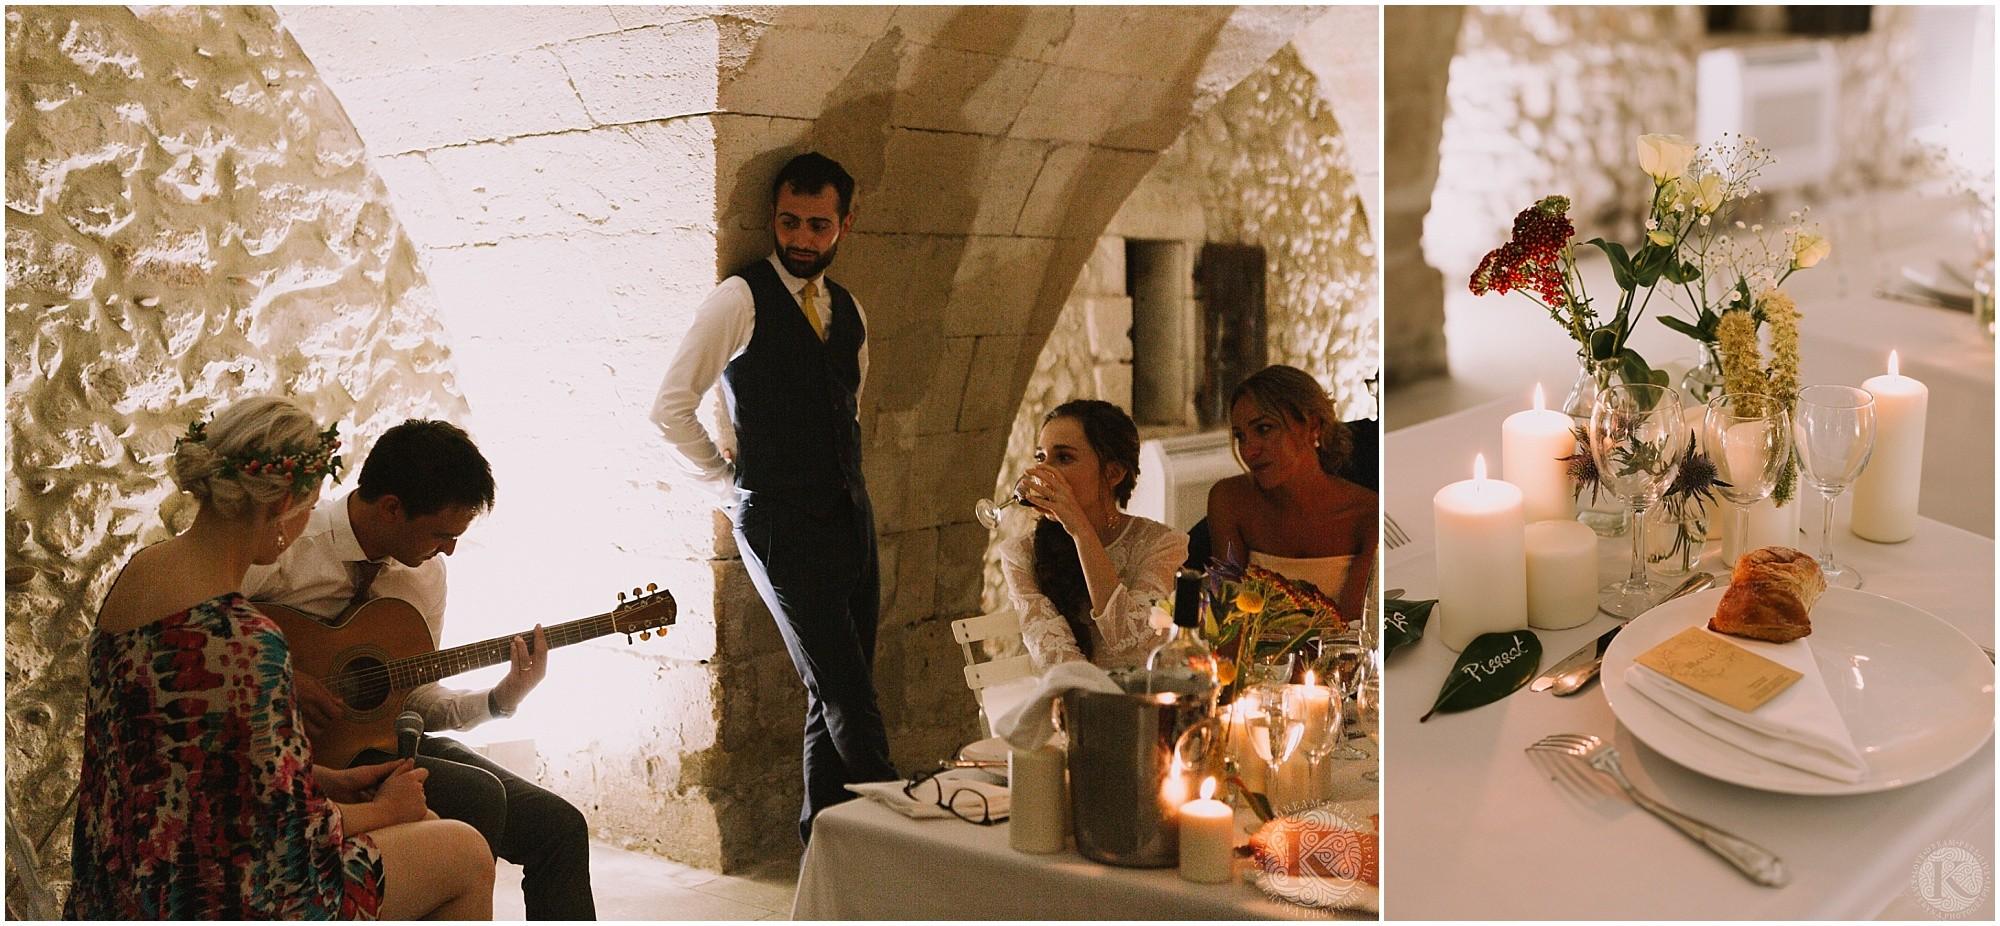 Kateryna-photos-photographe-mariage-vaucluse-provence-avignon-ferme-st-hugues_0093.jpg